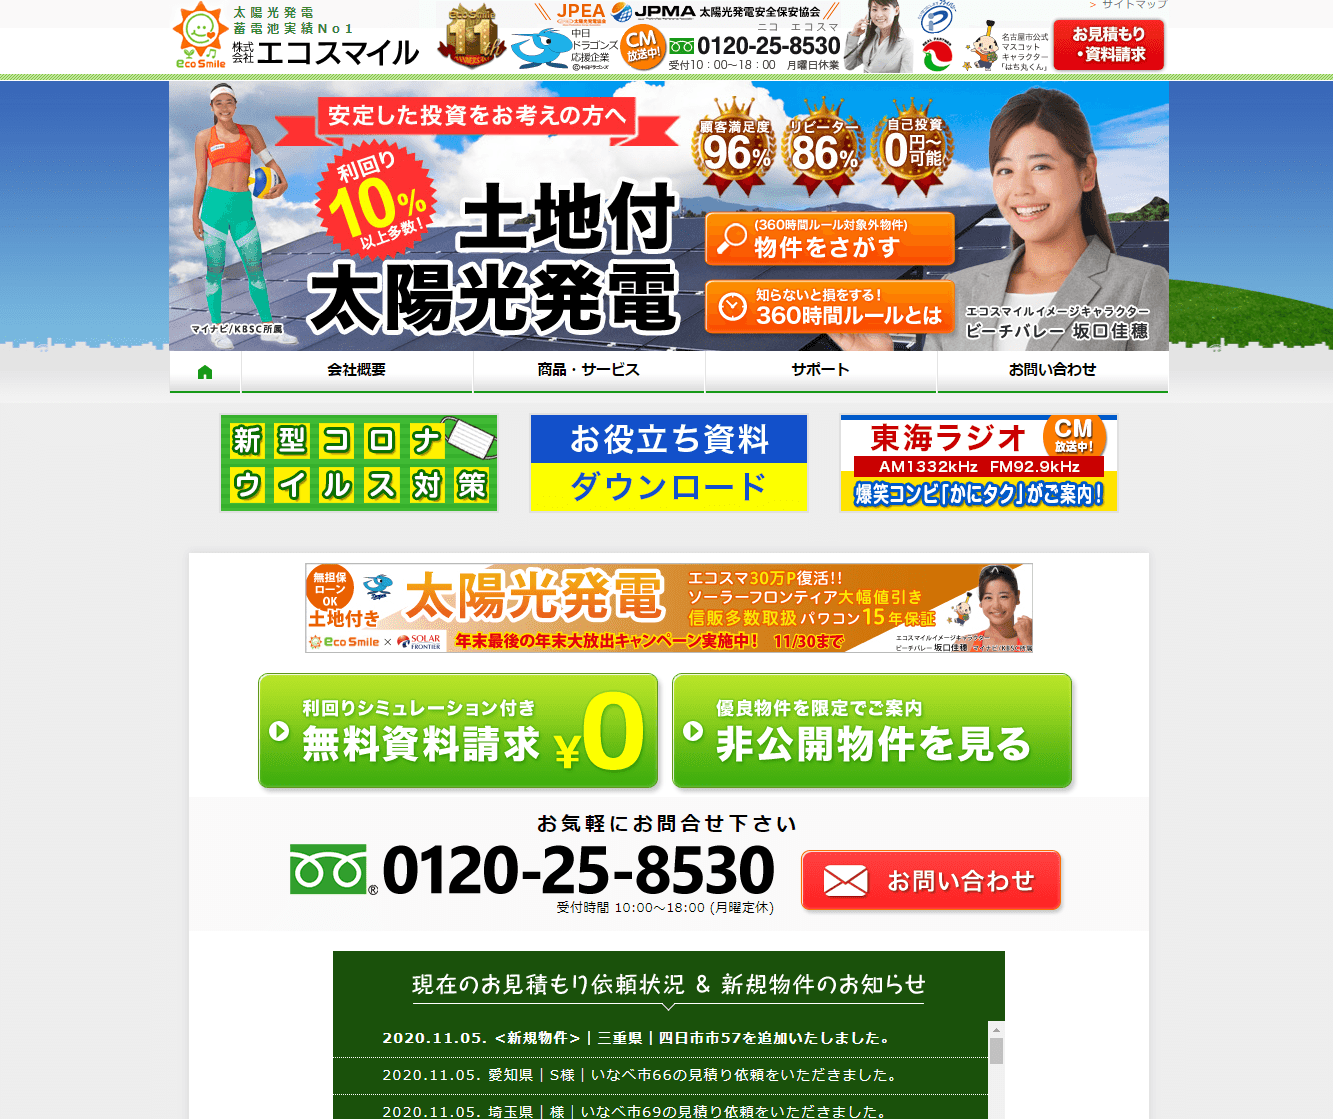 "<span class=""title"">株式会社エコスマイルの口コミや評判</span>"